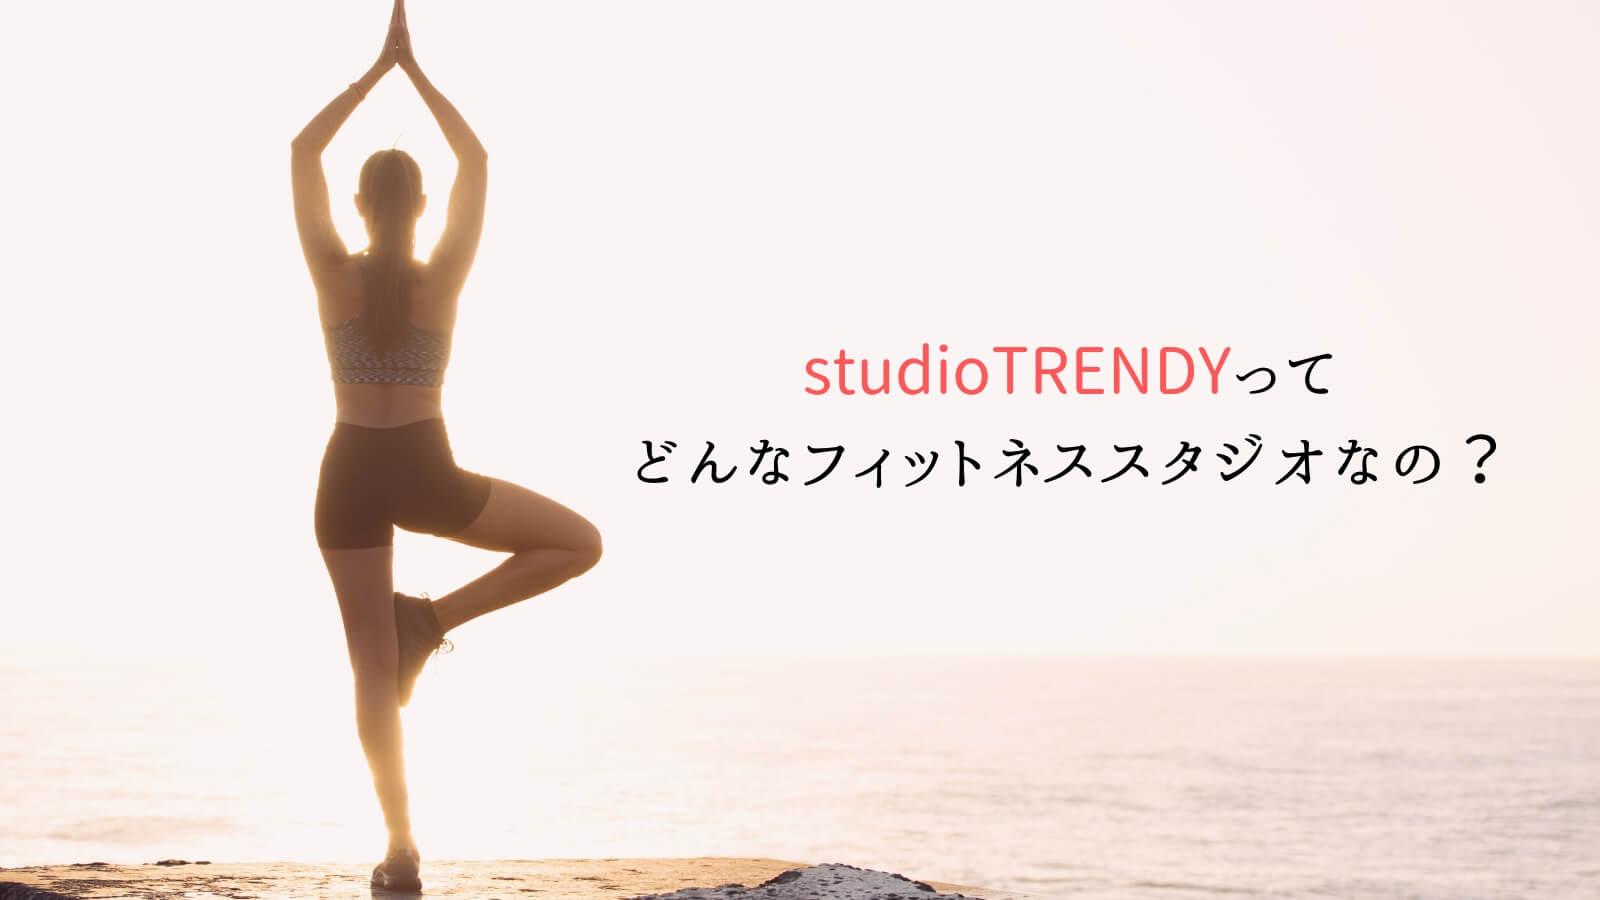 studioTRENDYってどんなフィットネススタジオなの?